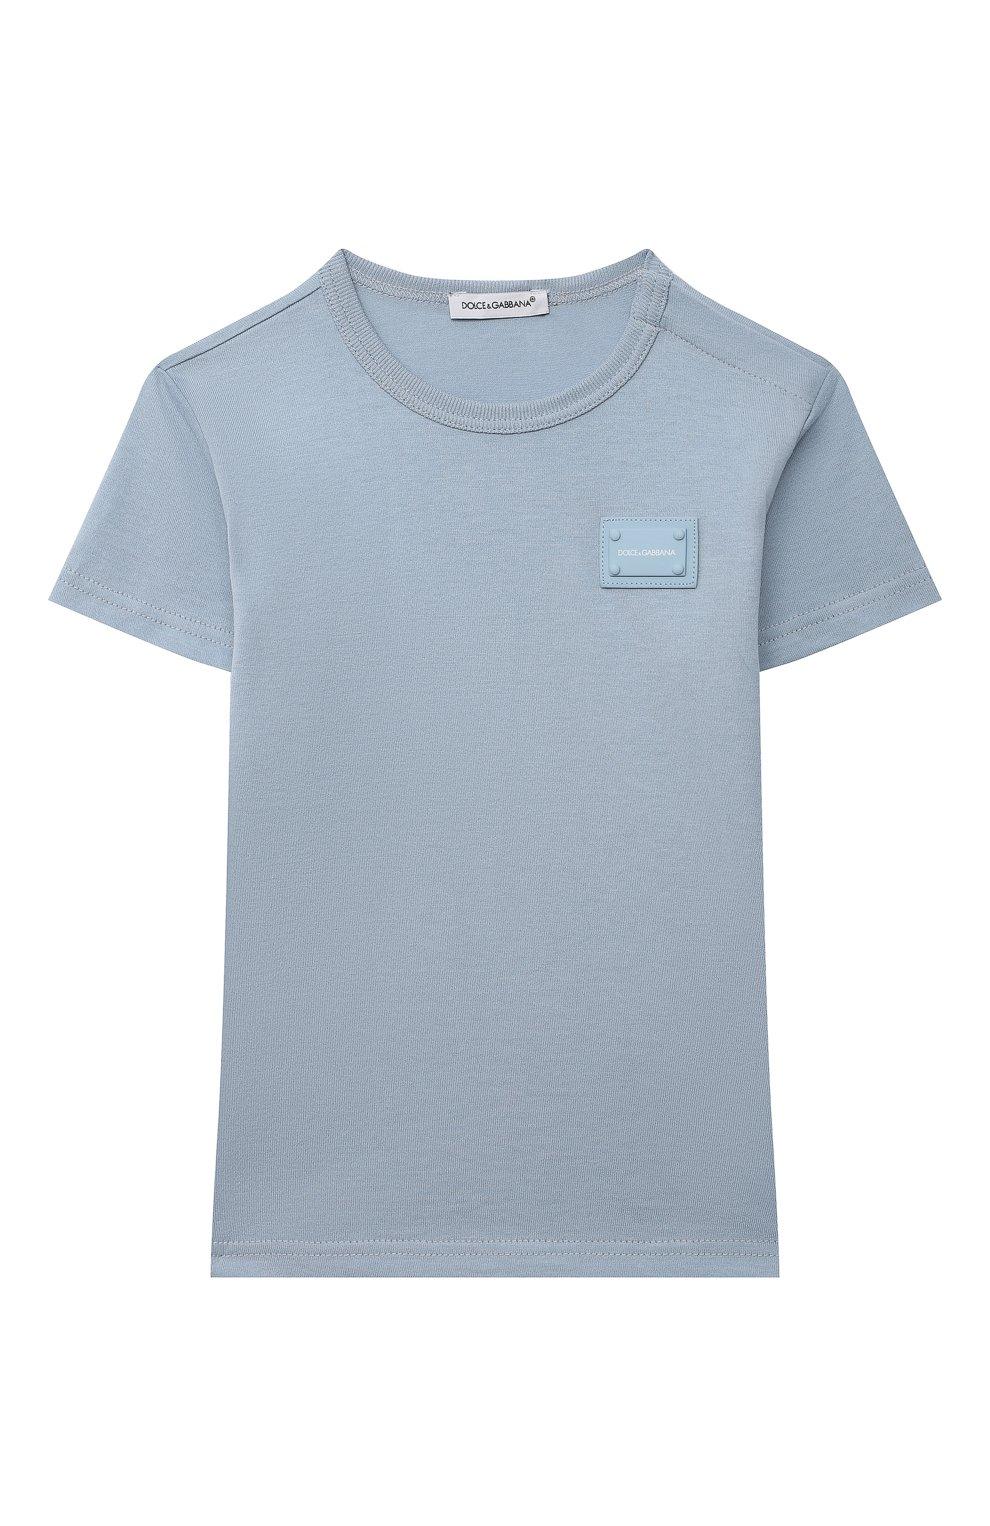 Детский хлопковая футболка DOLCE & GABBANA светло-голубого цвета, арт. L1JT7T/G70LK   Фото 1